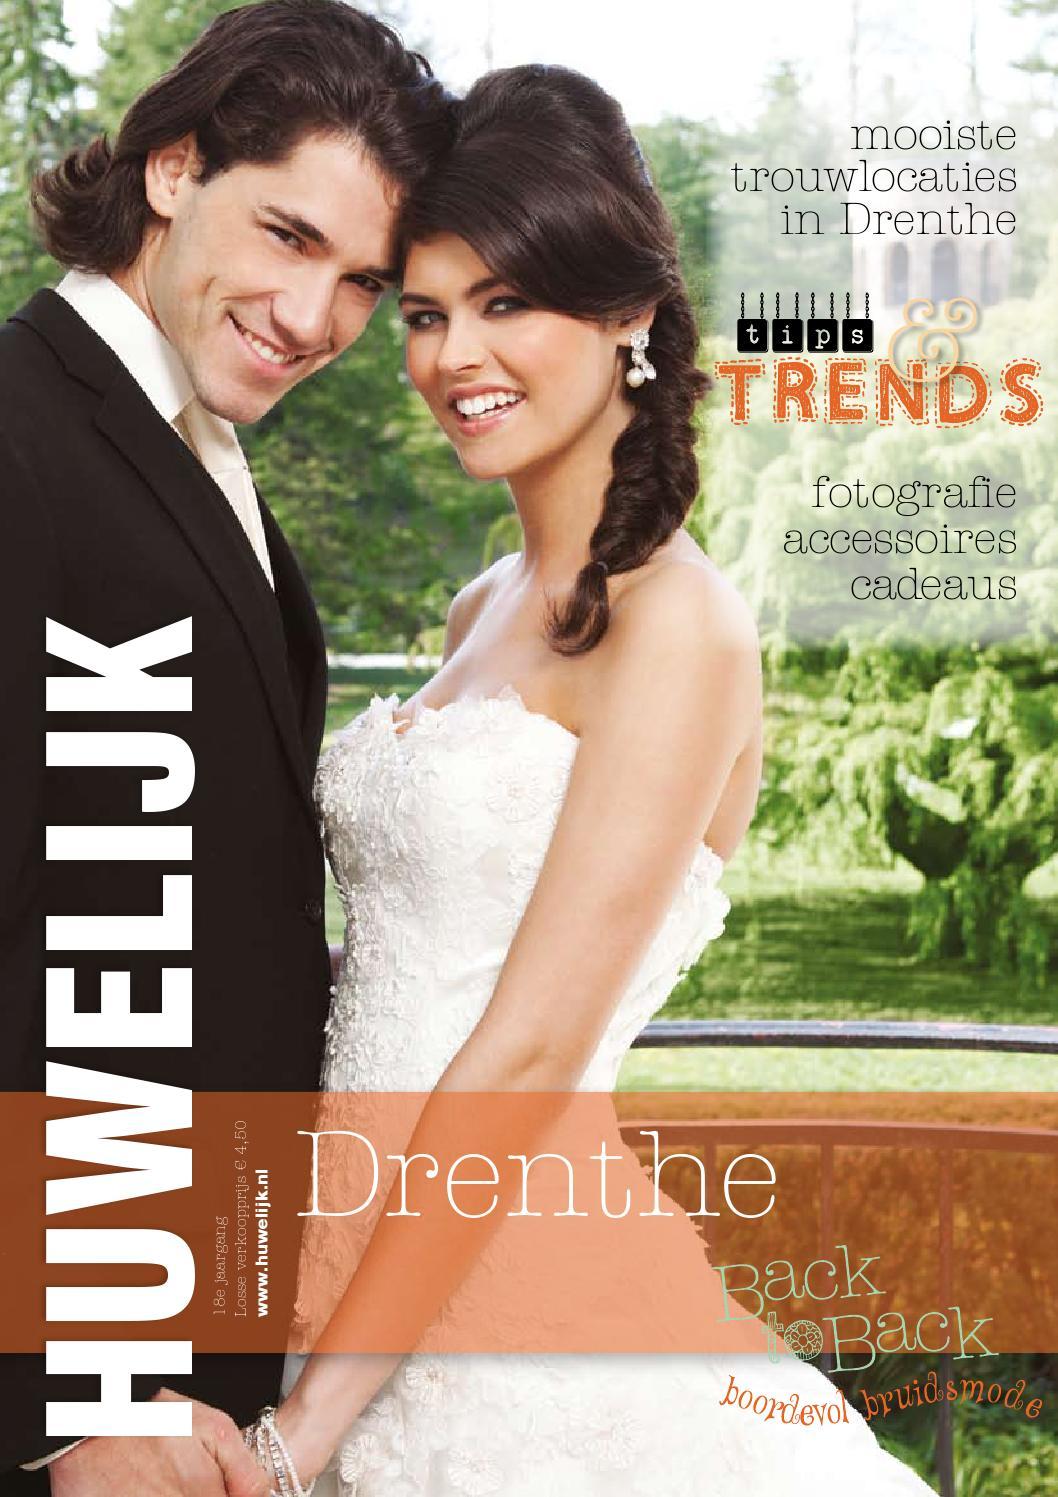 Huwelijk in drenthe 2014 by ward media   issuu